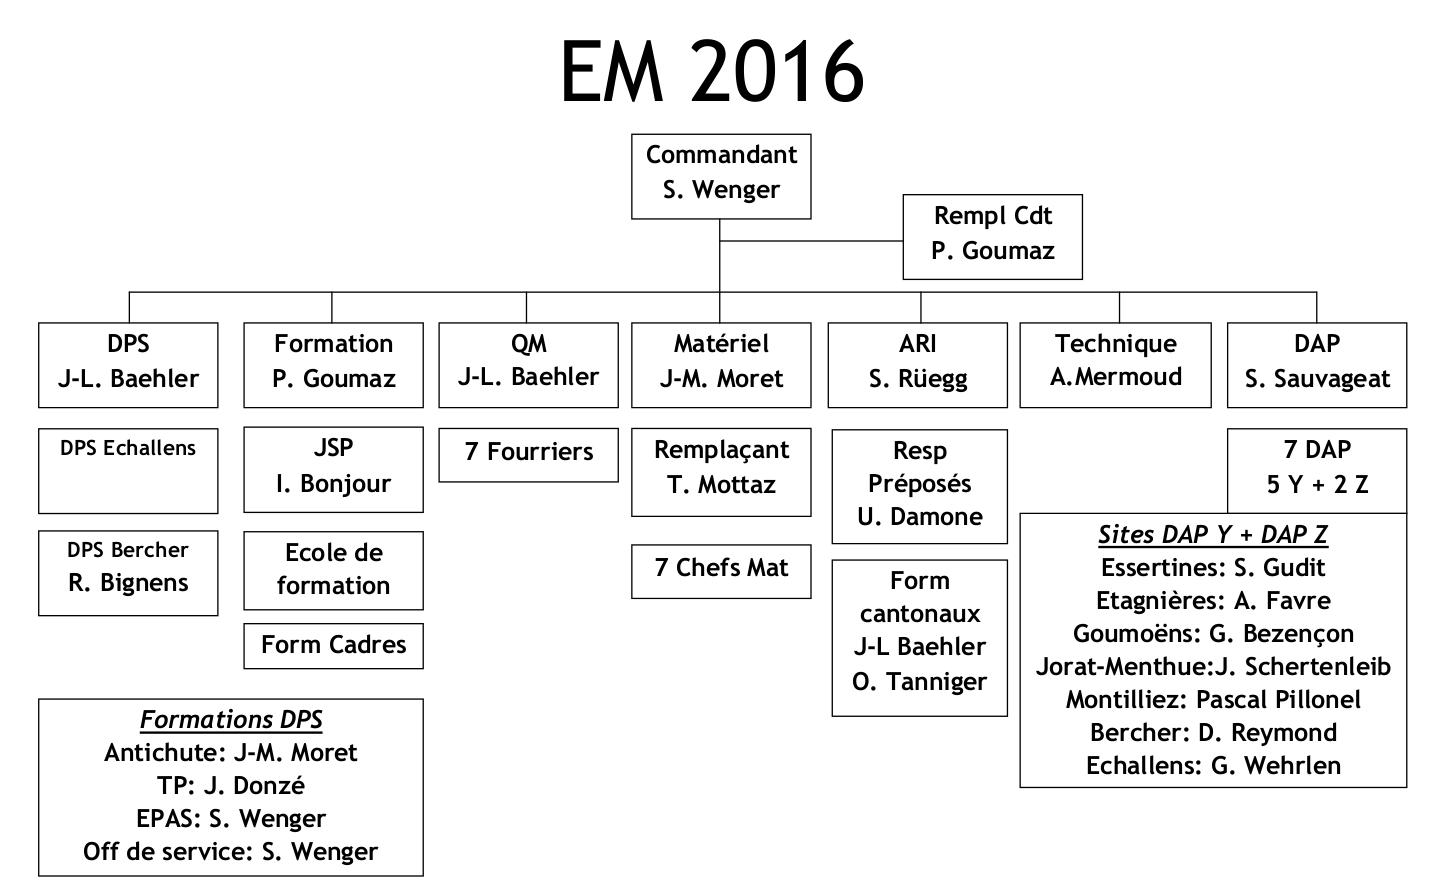 EM2016